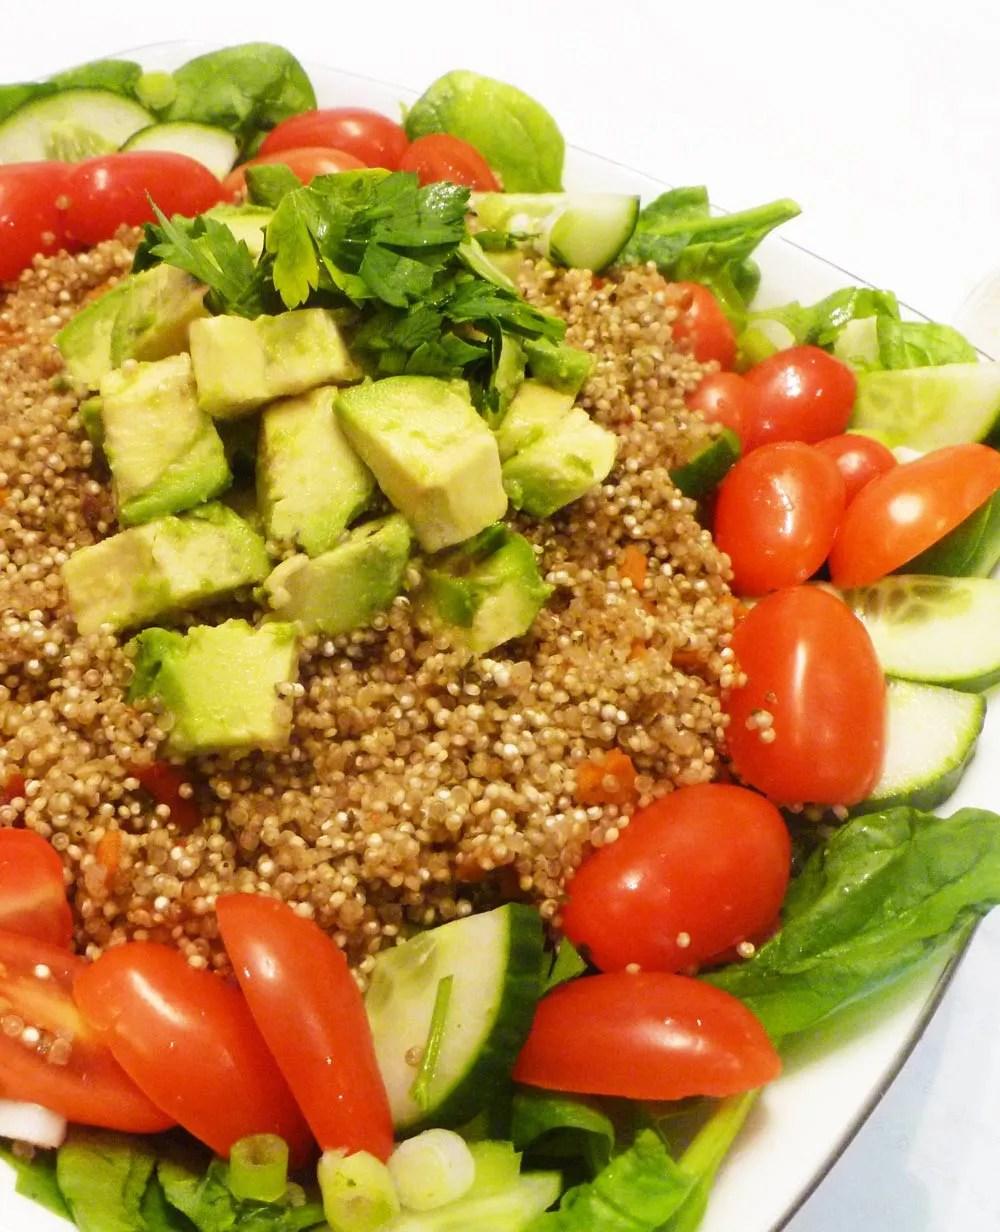 Warm Avocado Quinoa Salad - This Happy Mommy